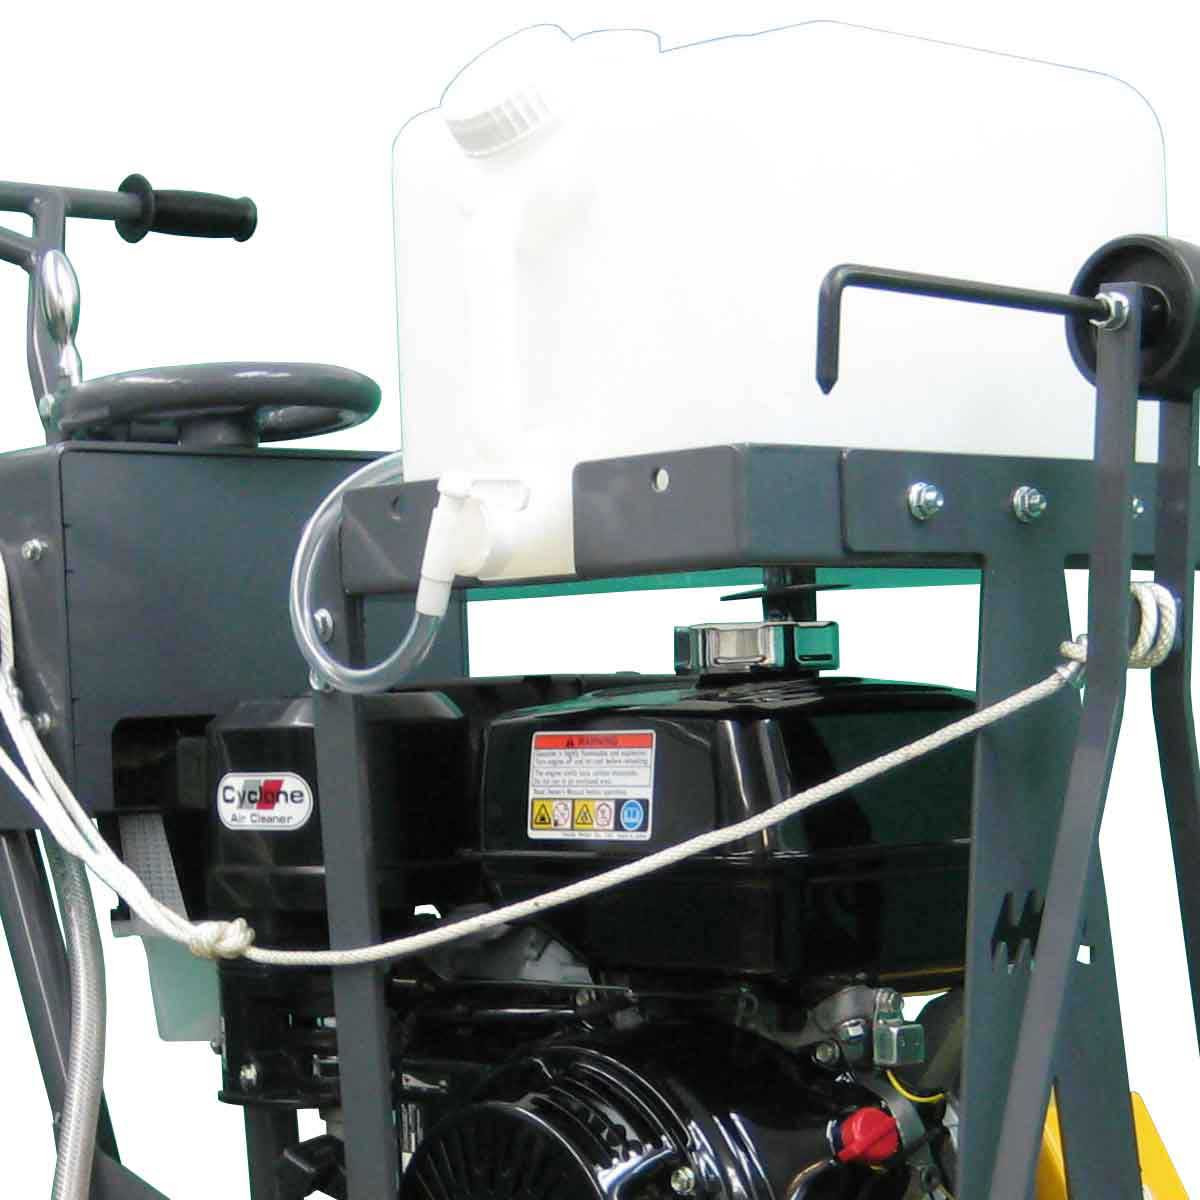 Sp118 Multiquip Water tank Kit